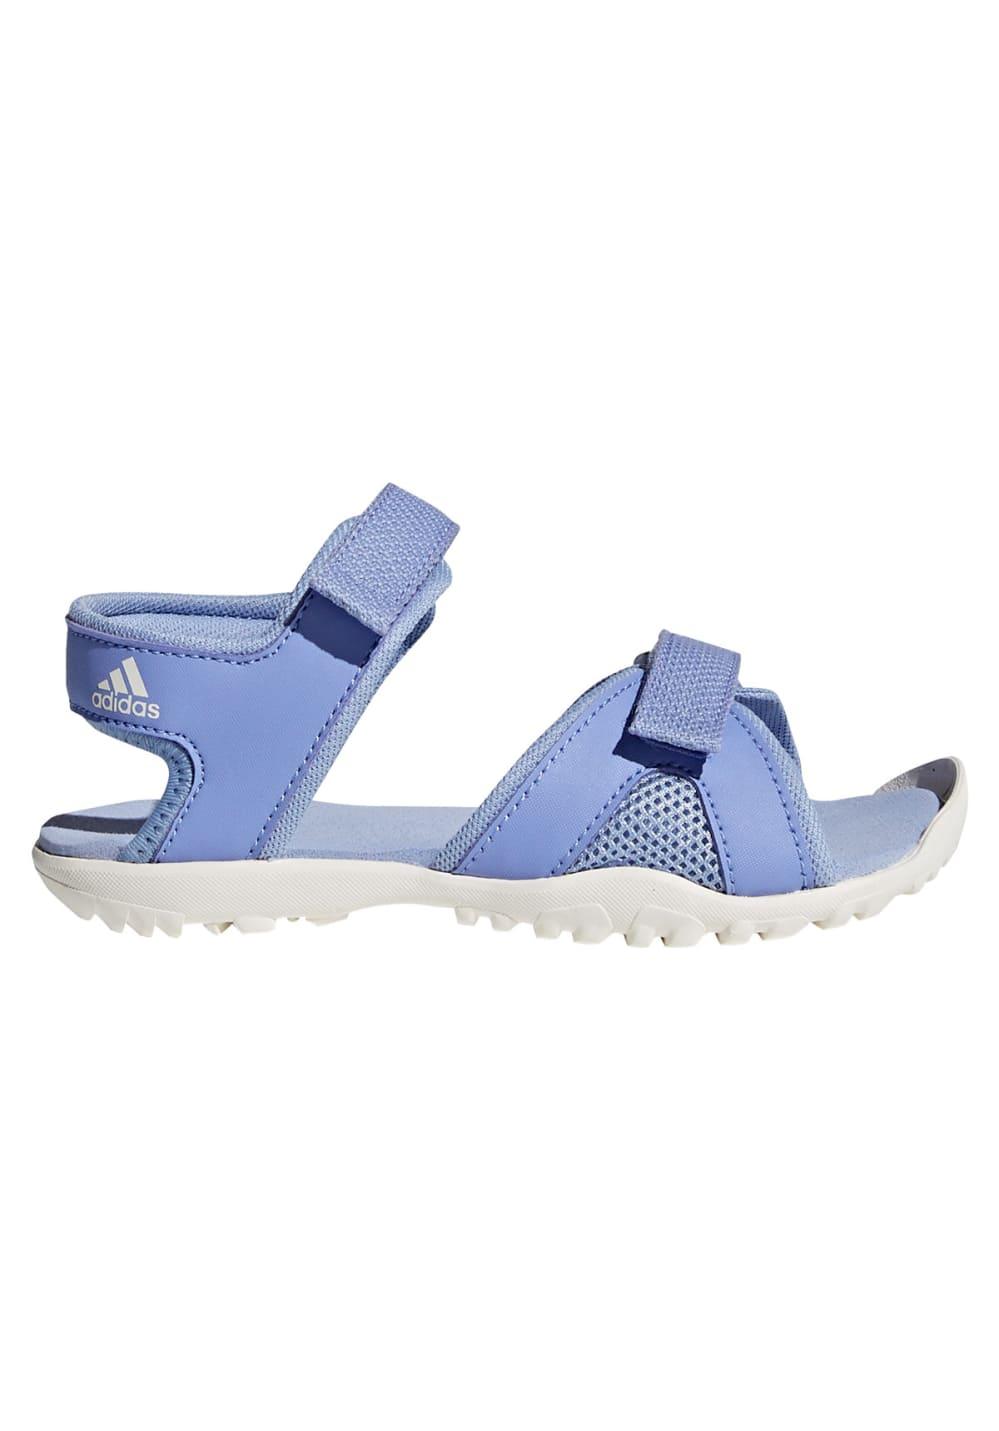 Outdoor Sandalen Blau Sandplay Terrex Adidas Outdoorschuhe CsQtdhrx